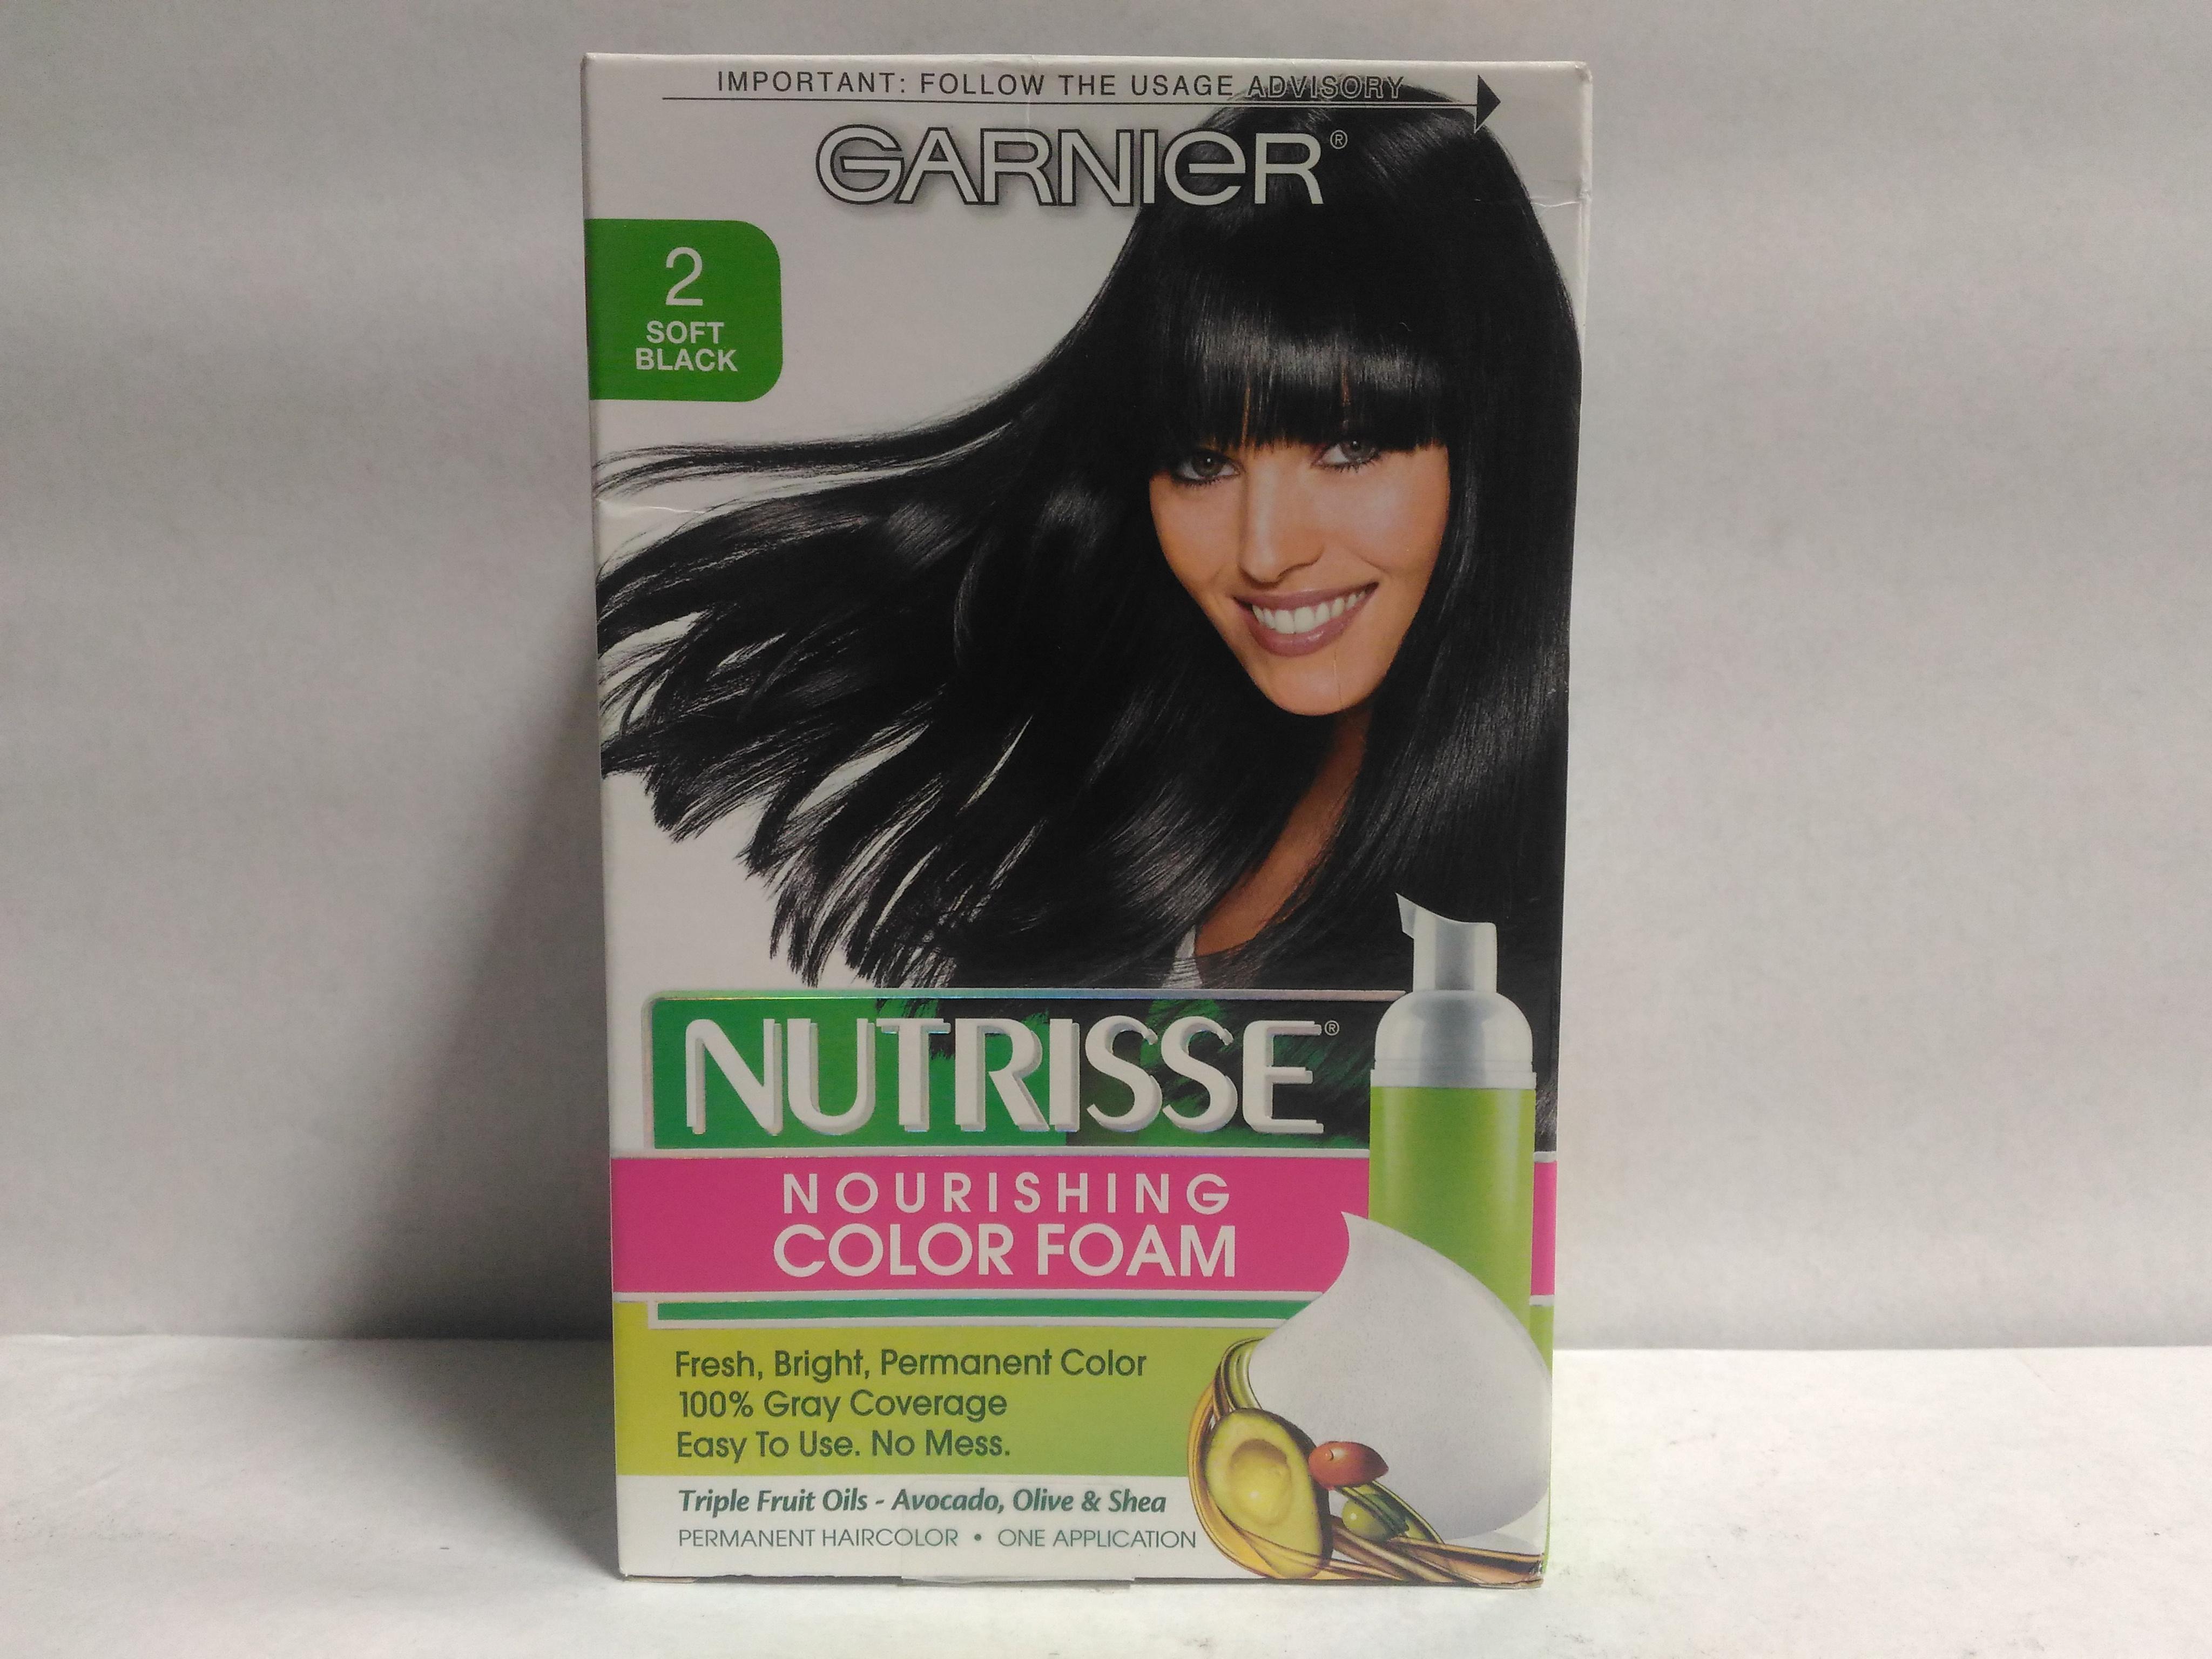 Garnier Nutrisse Nourishing Color Foam Permanent Hair